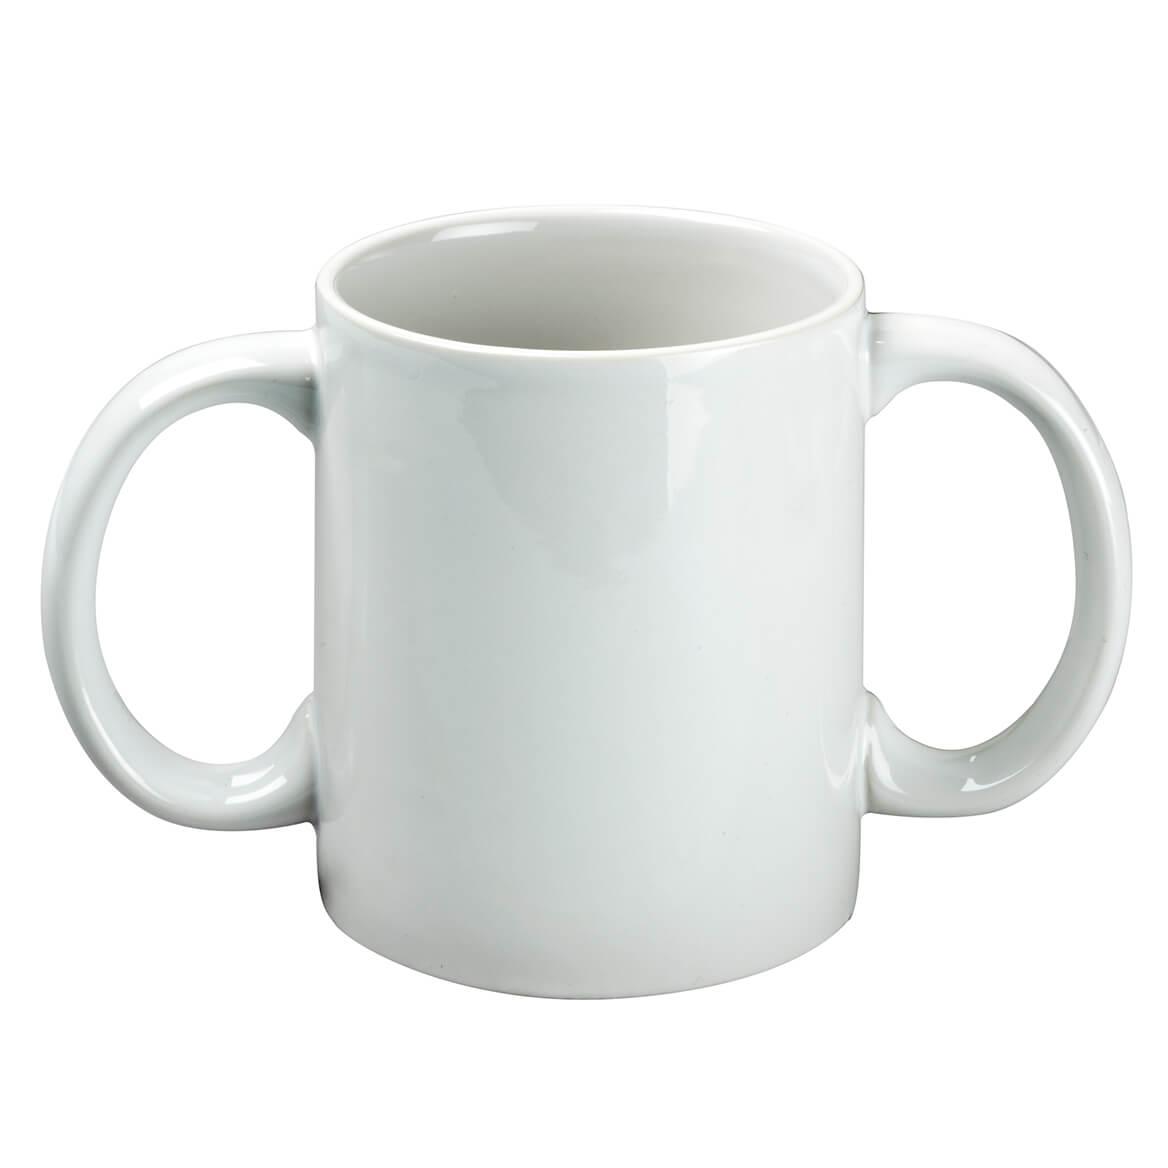 Double Grip Mug-347050